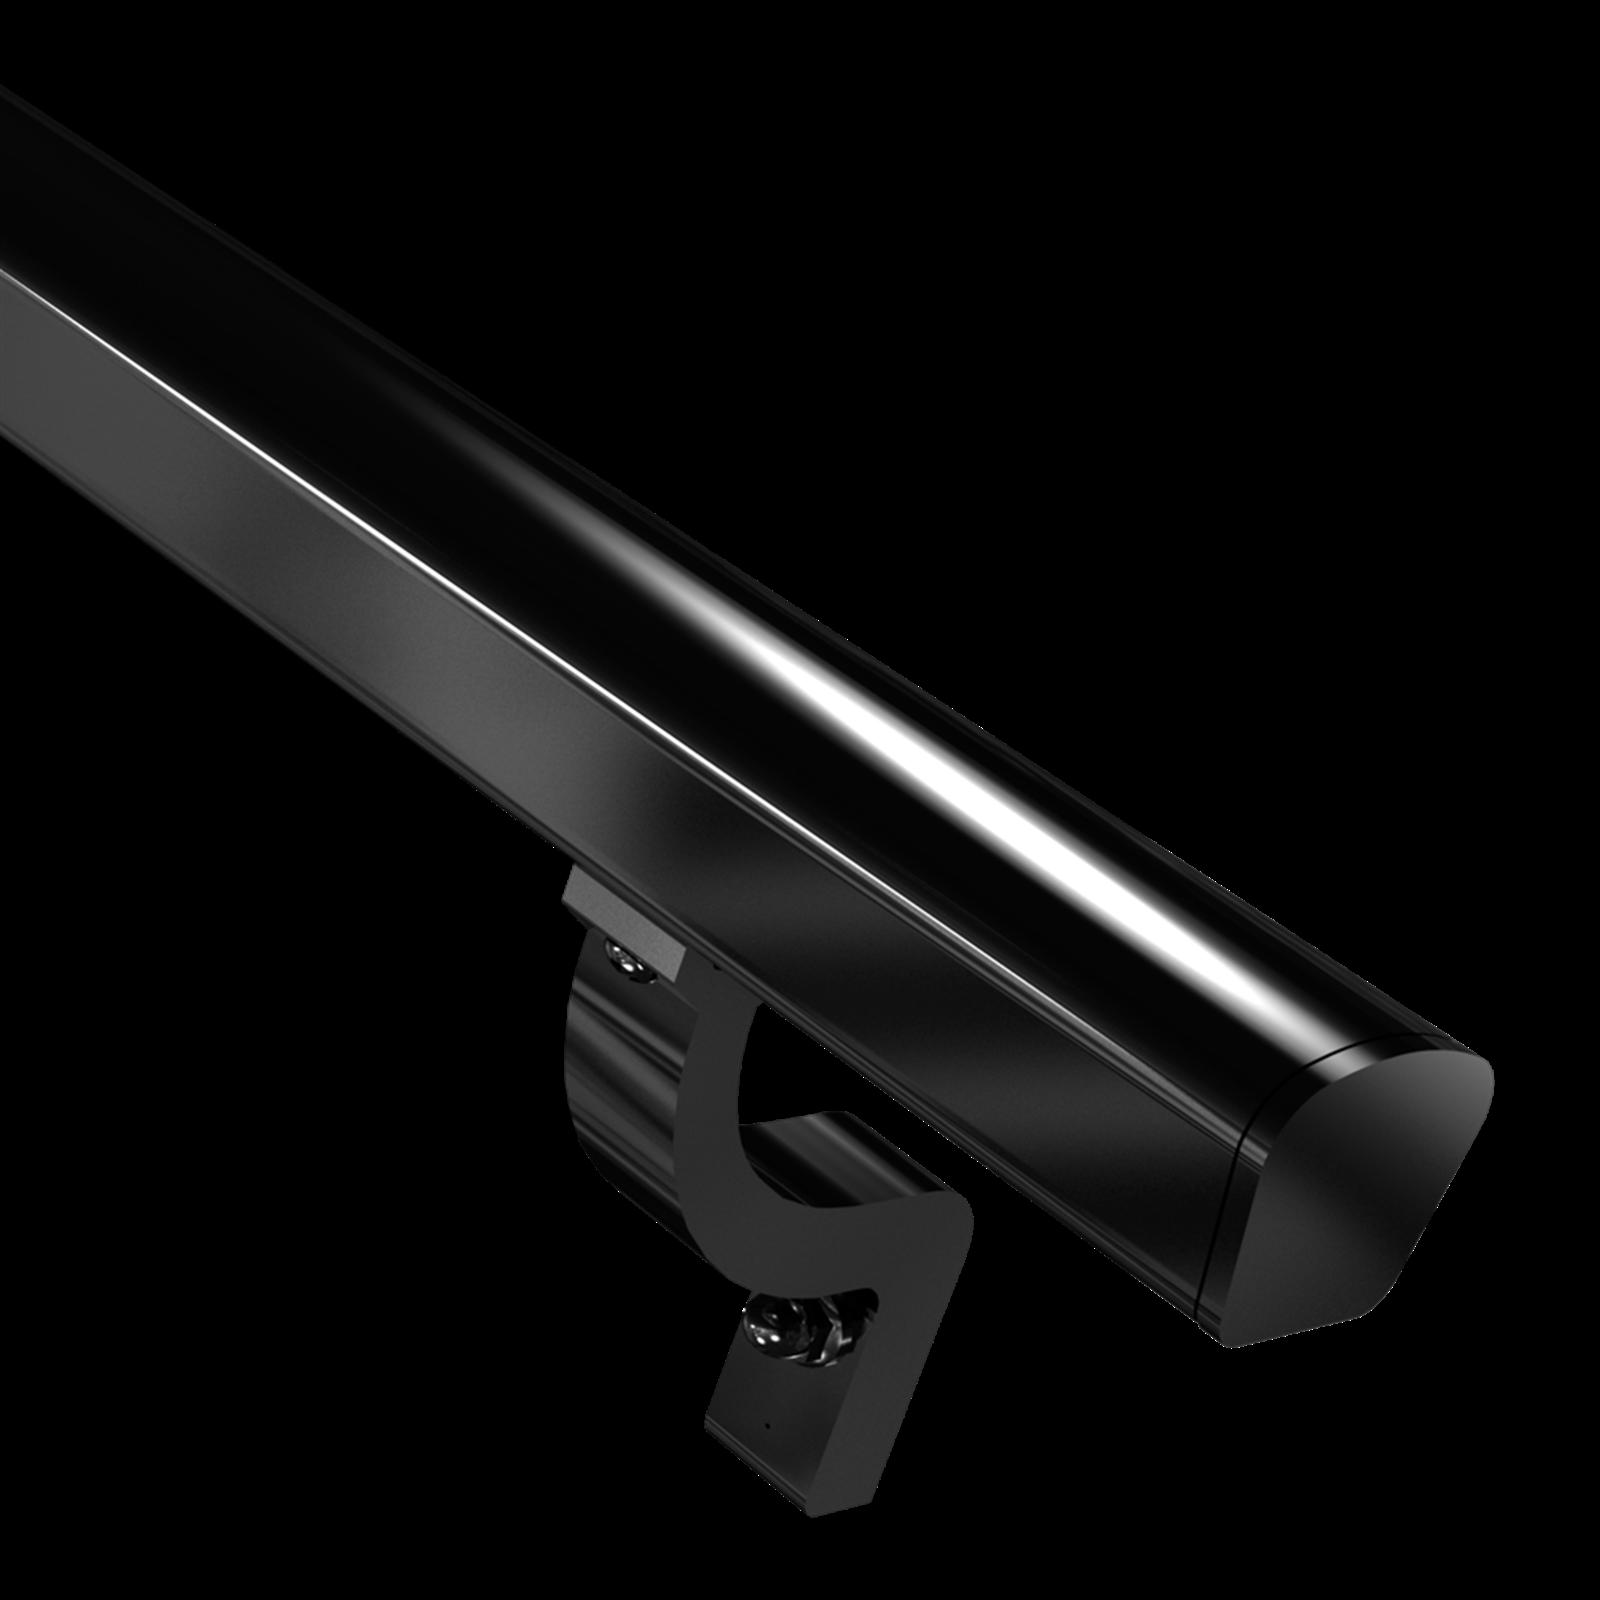 Peak Products 1800mm Black Aluminium Modular Handrail Kit